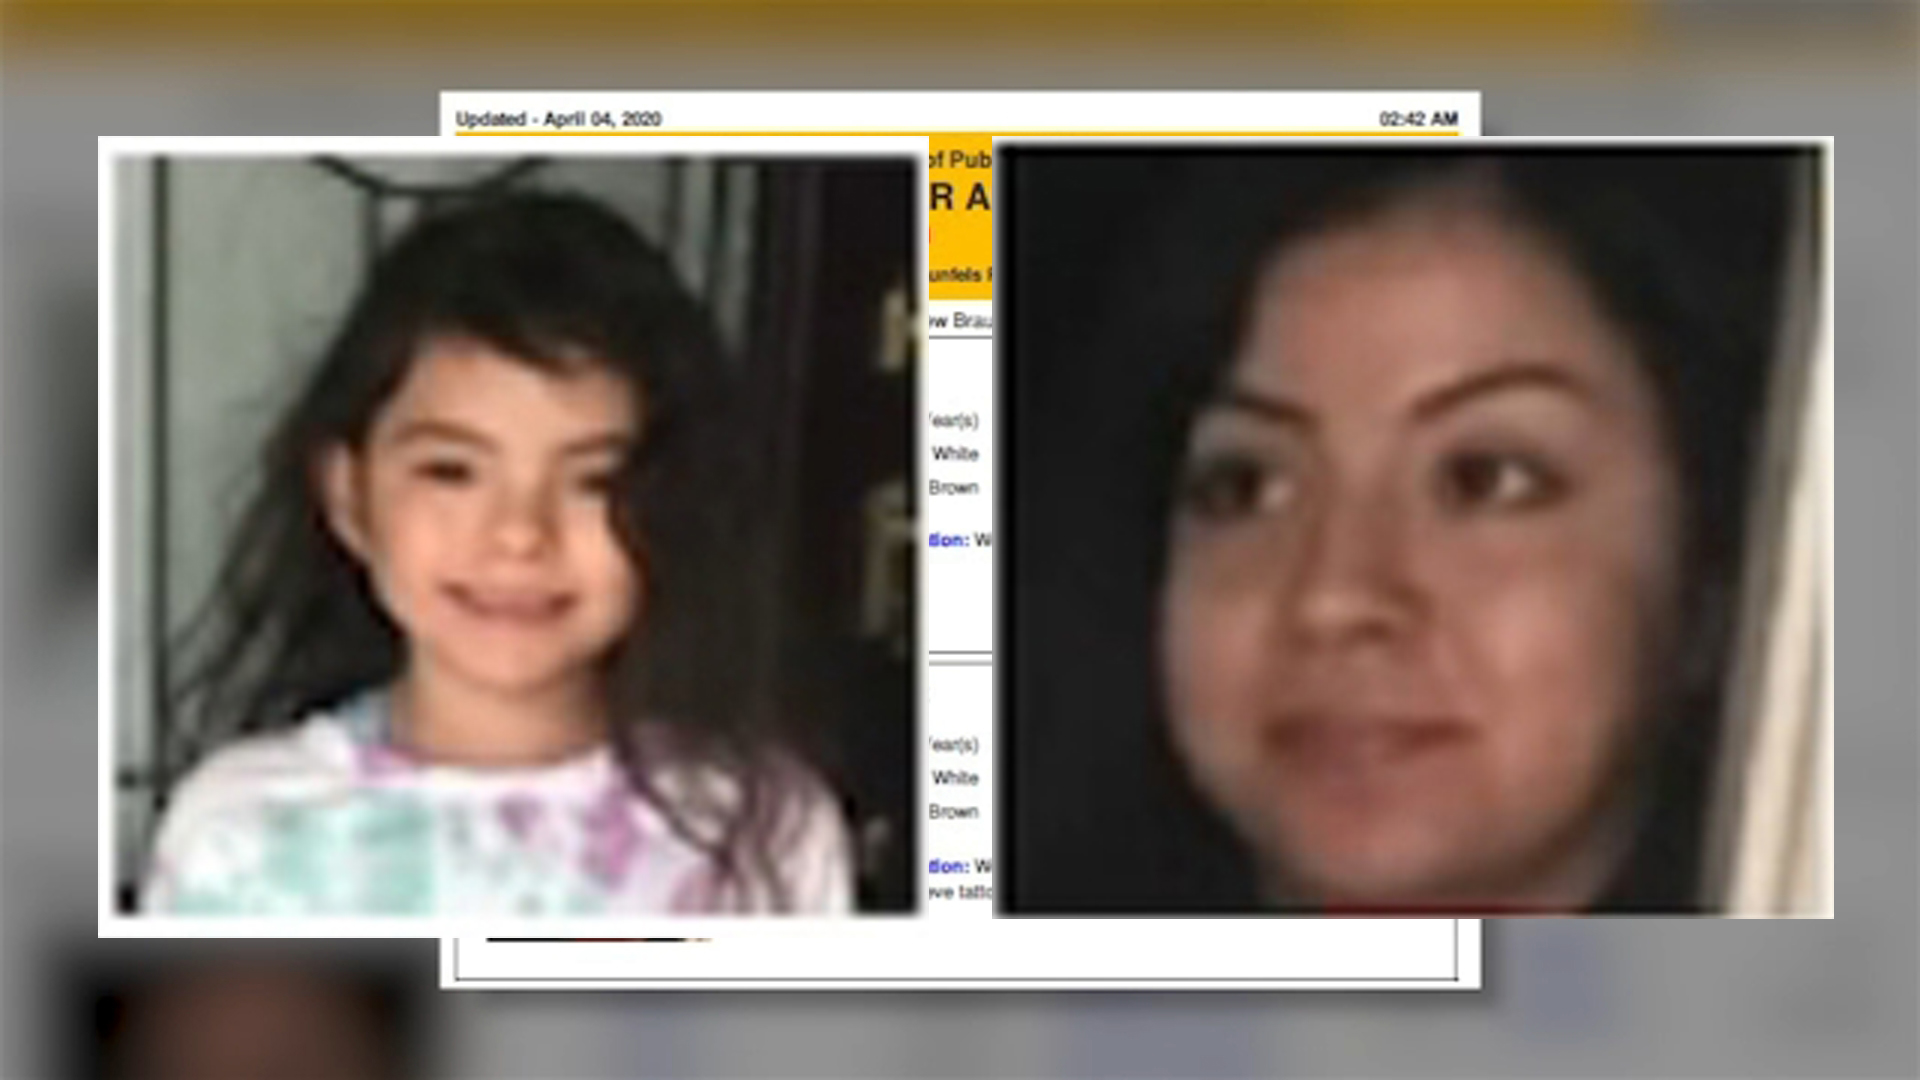 Child Abduction Abc13 Houston